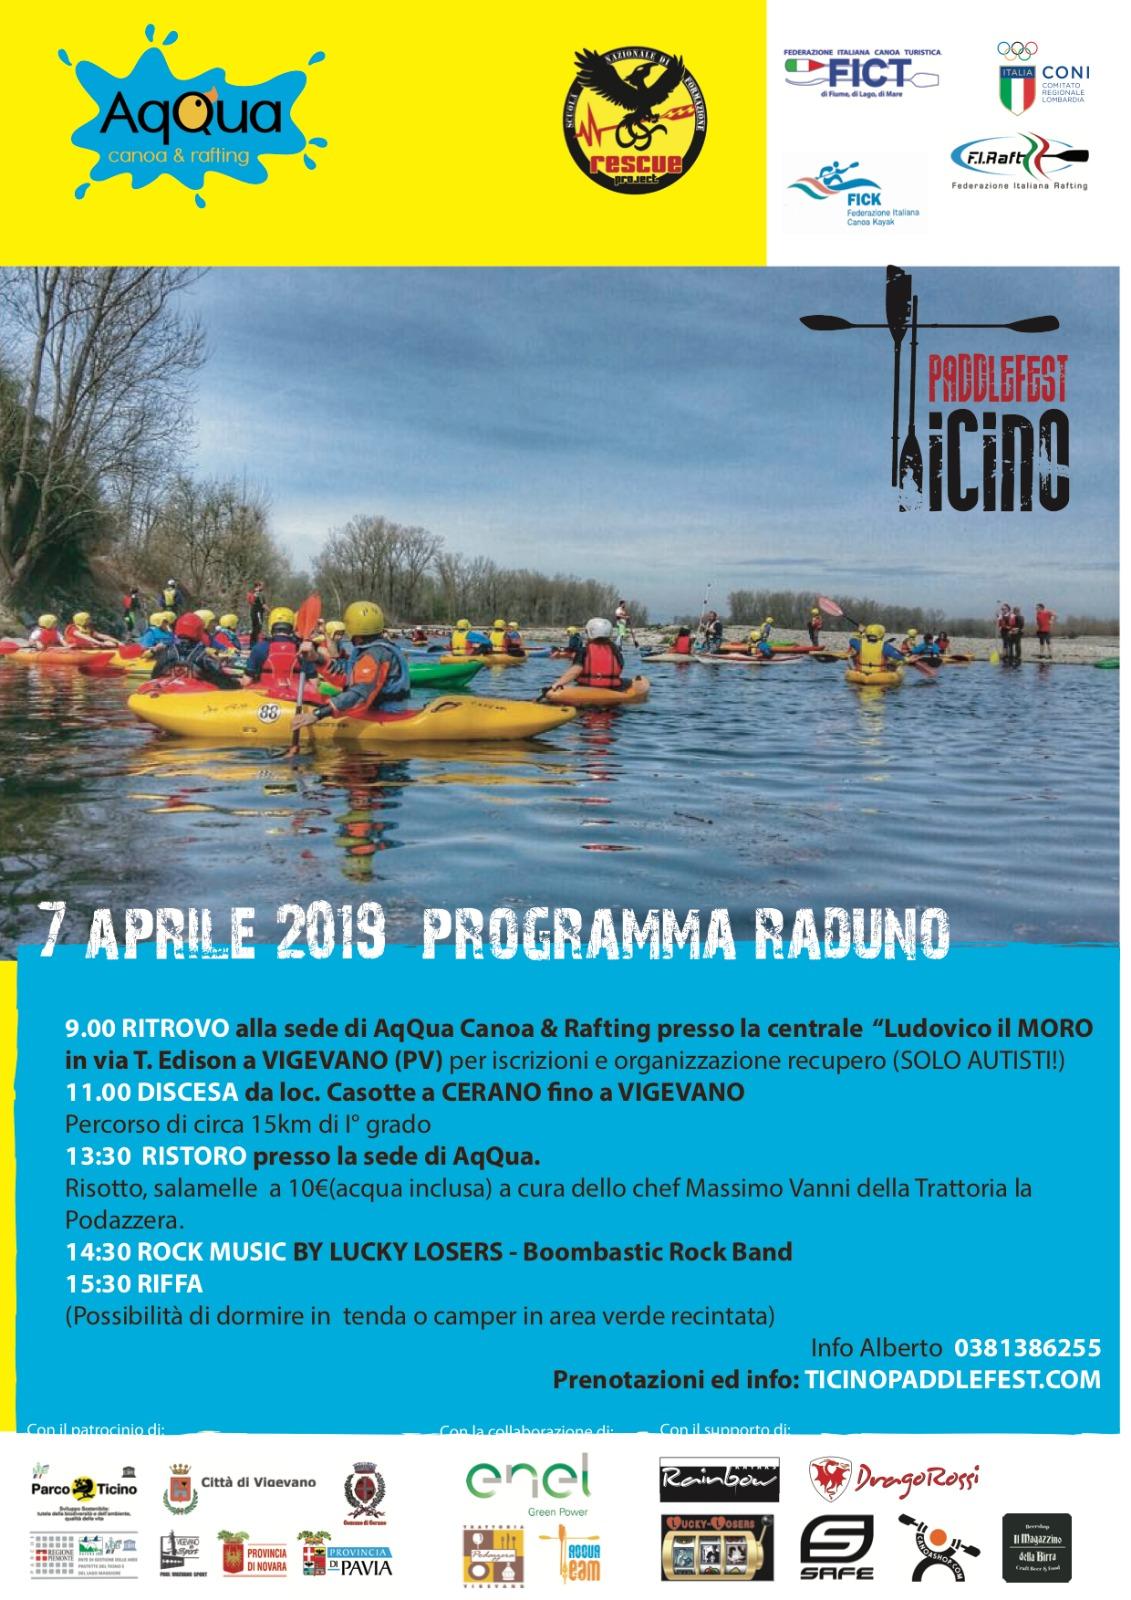 Ticino PaddleFest 2019